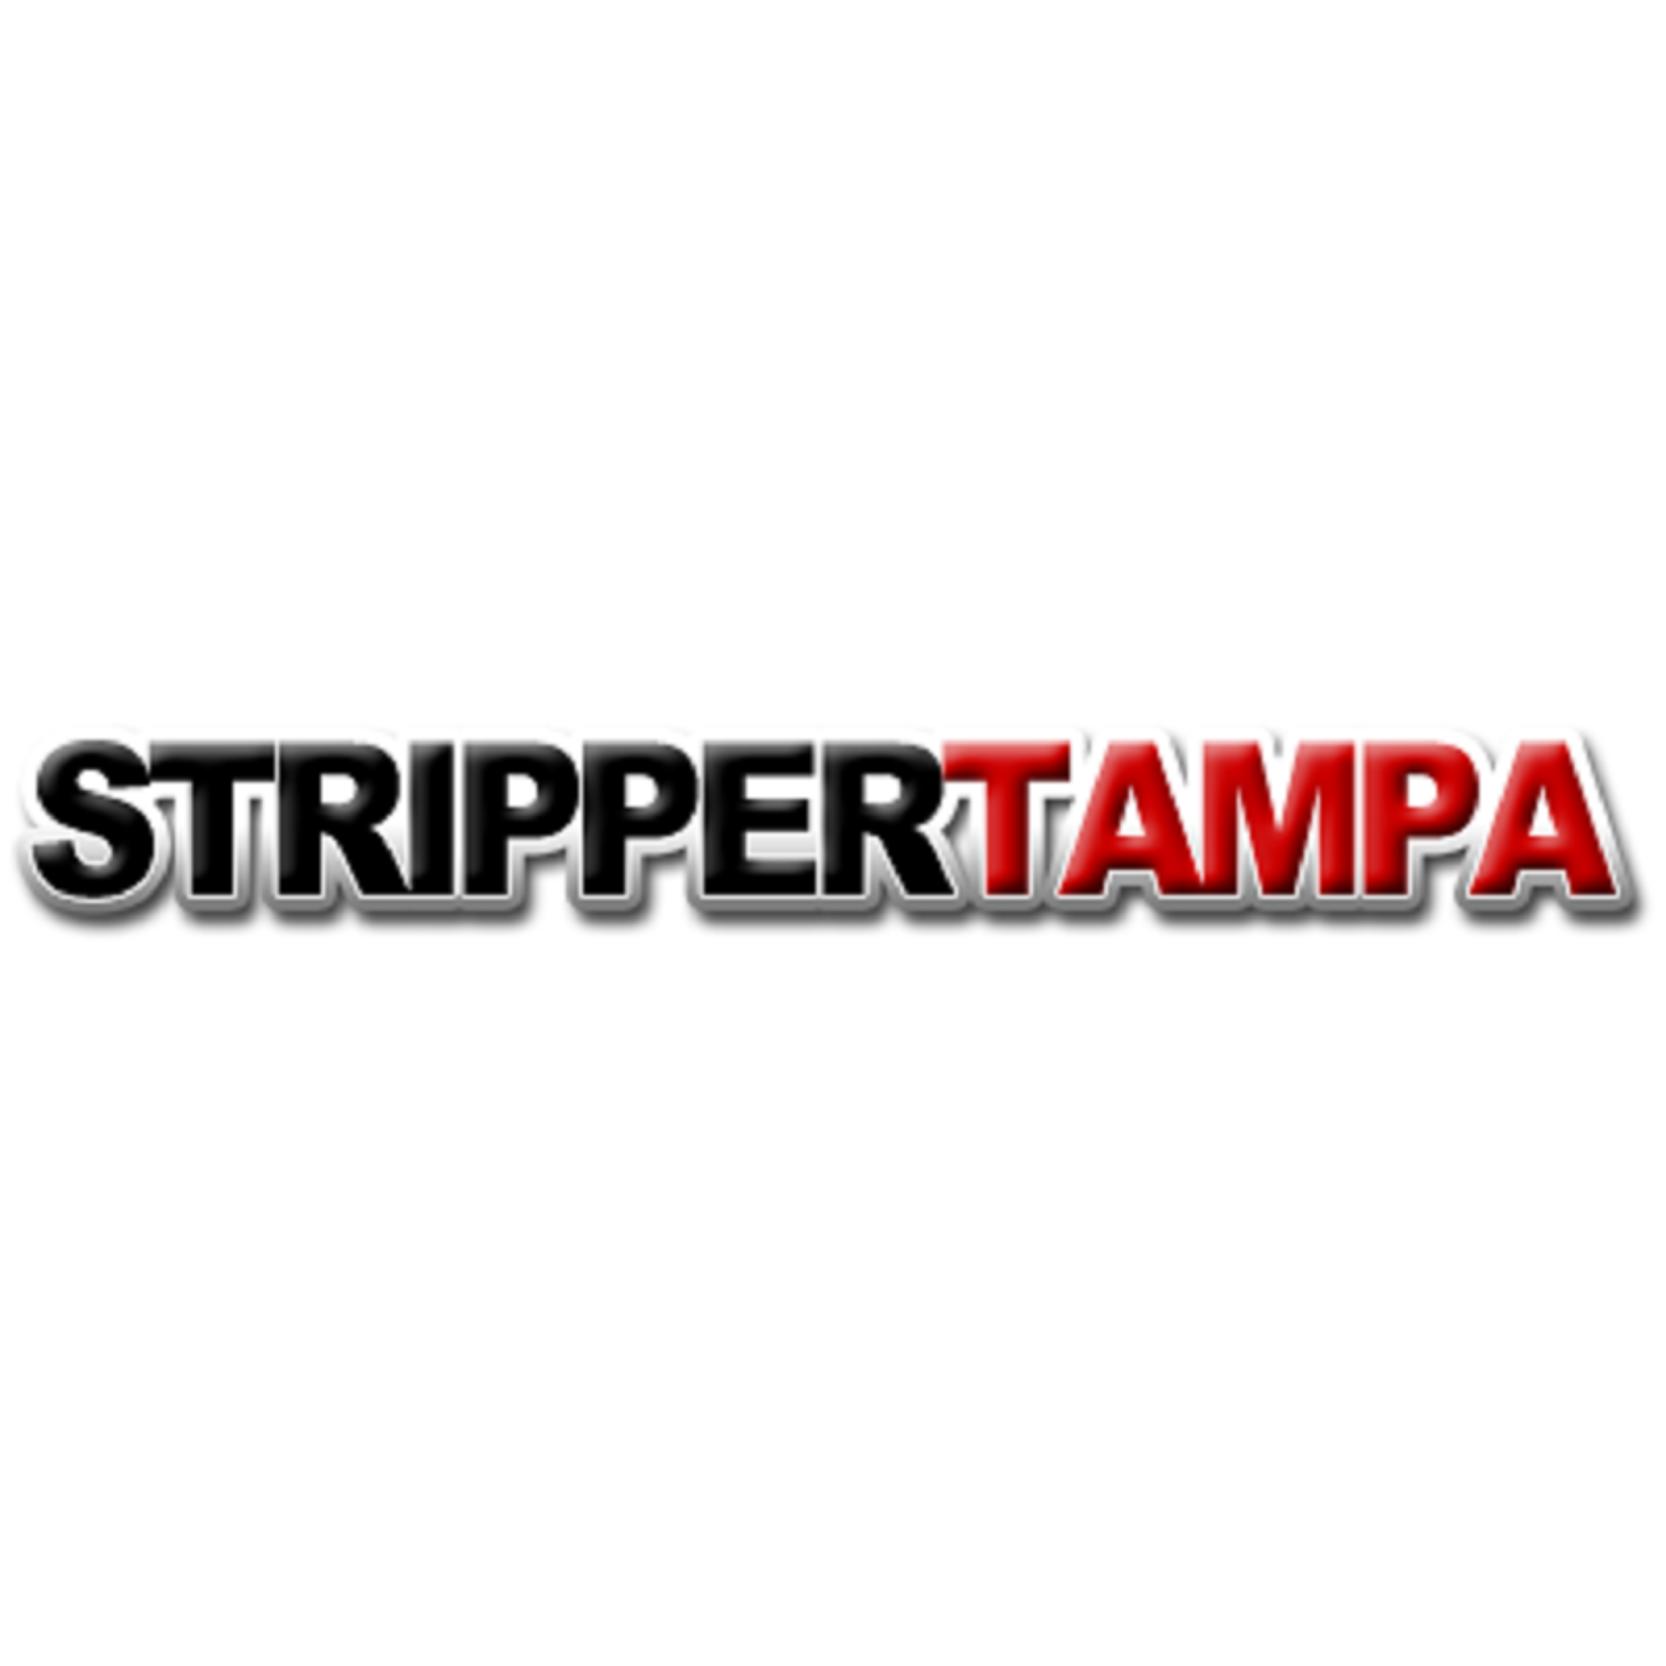 Stripper Tampa image 3